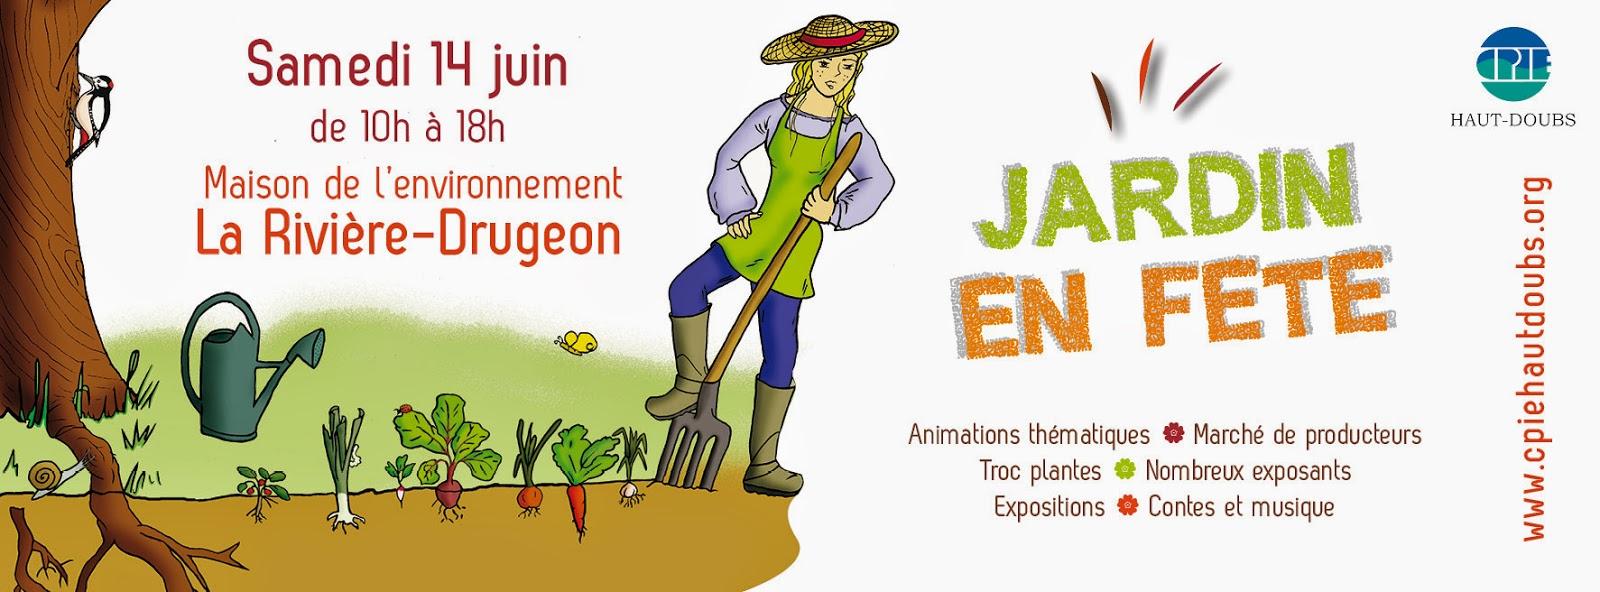 http://www.cpiehautdoubs.org/babylone/nos-activites/activites-animations-adultes-enfants-environnement/l-animation-loisirs/jardin-en-fete_131.php